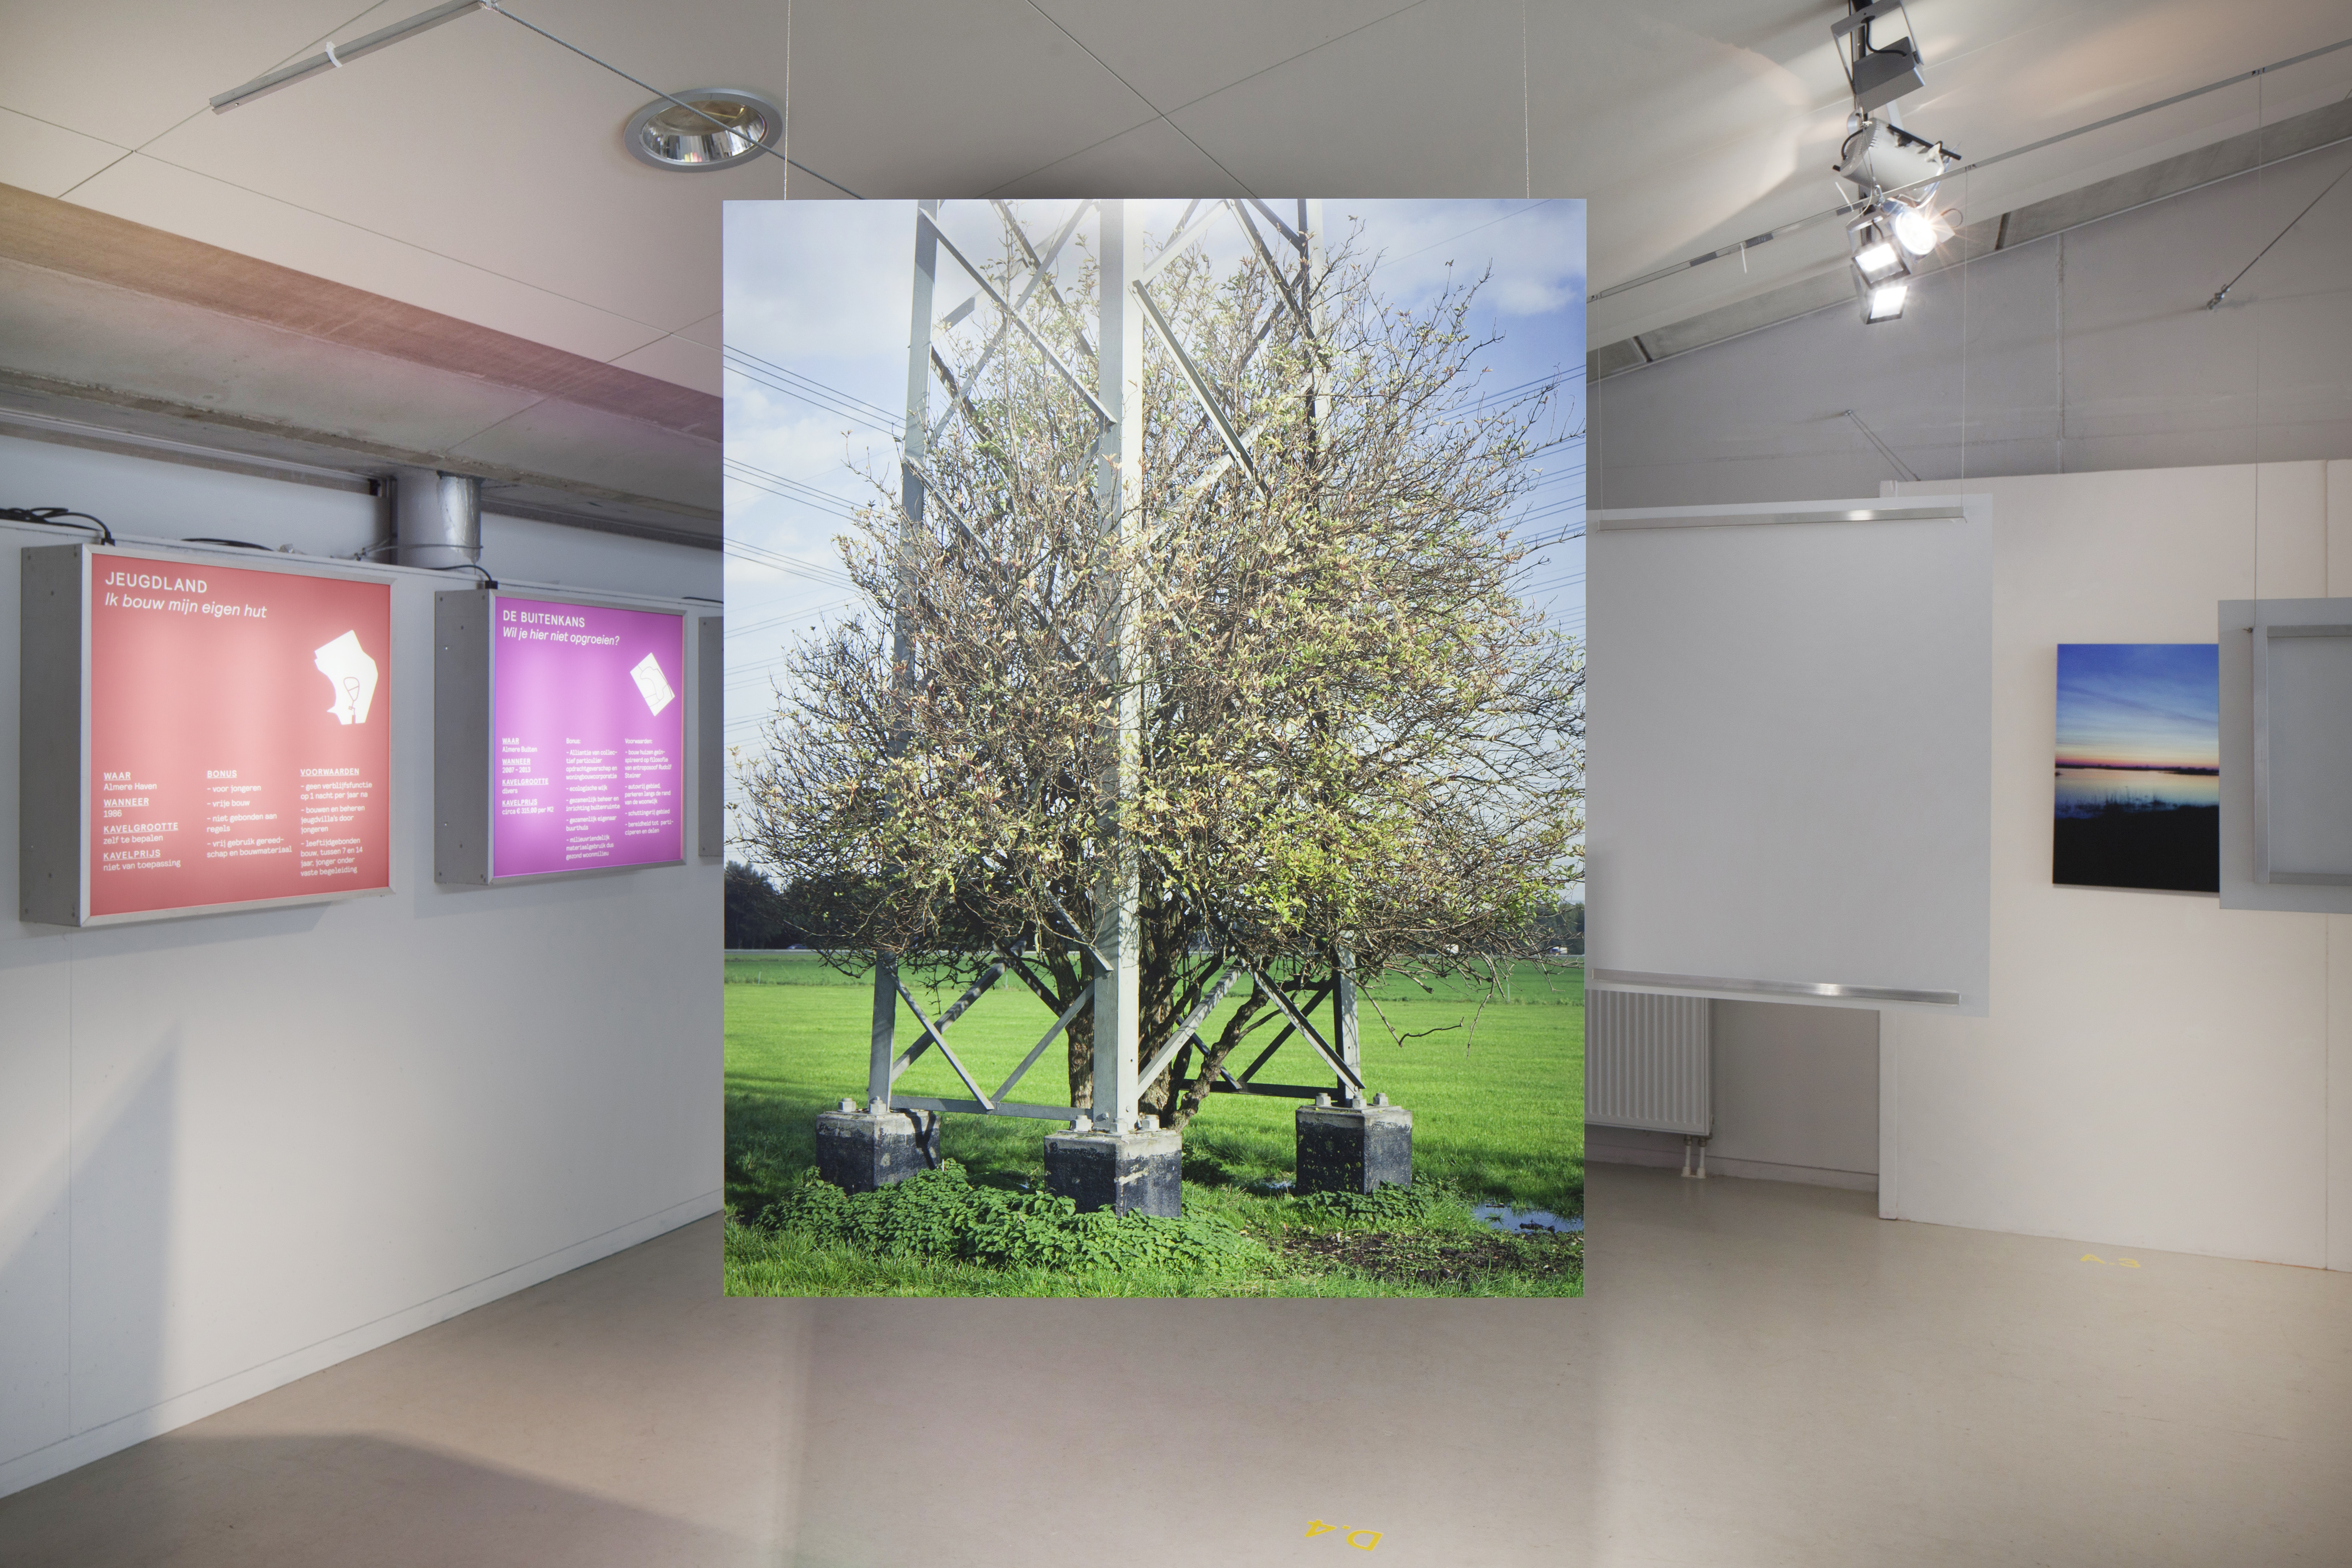 Freedomland_DenisGuzzo_Installation view_Amlere2013-8358